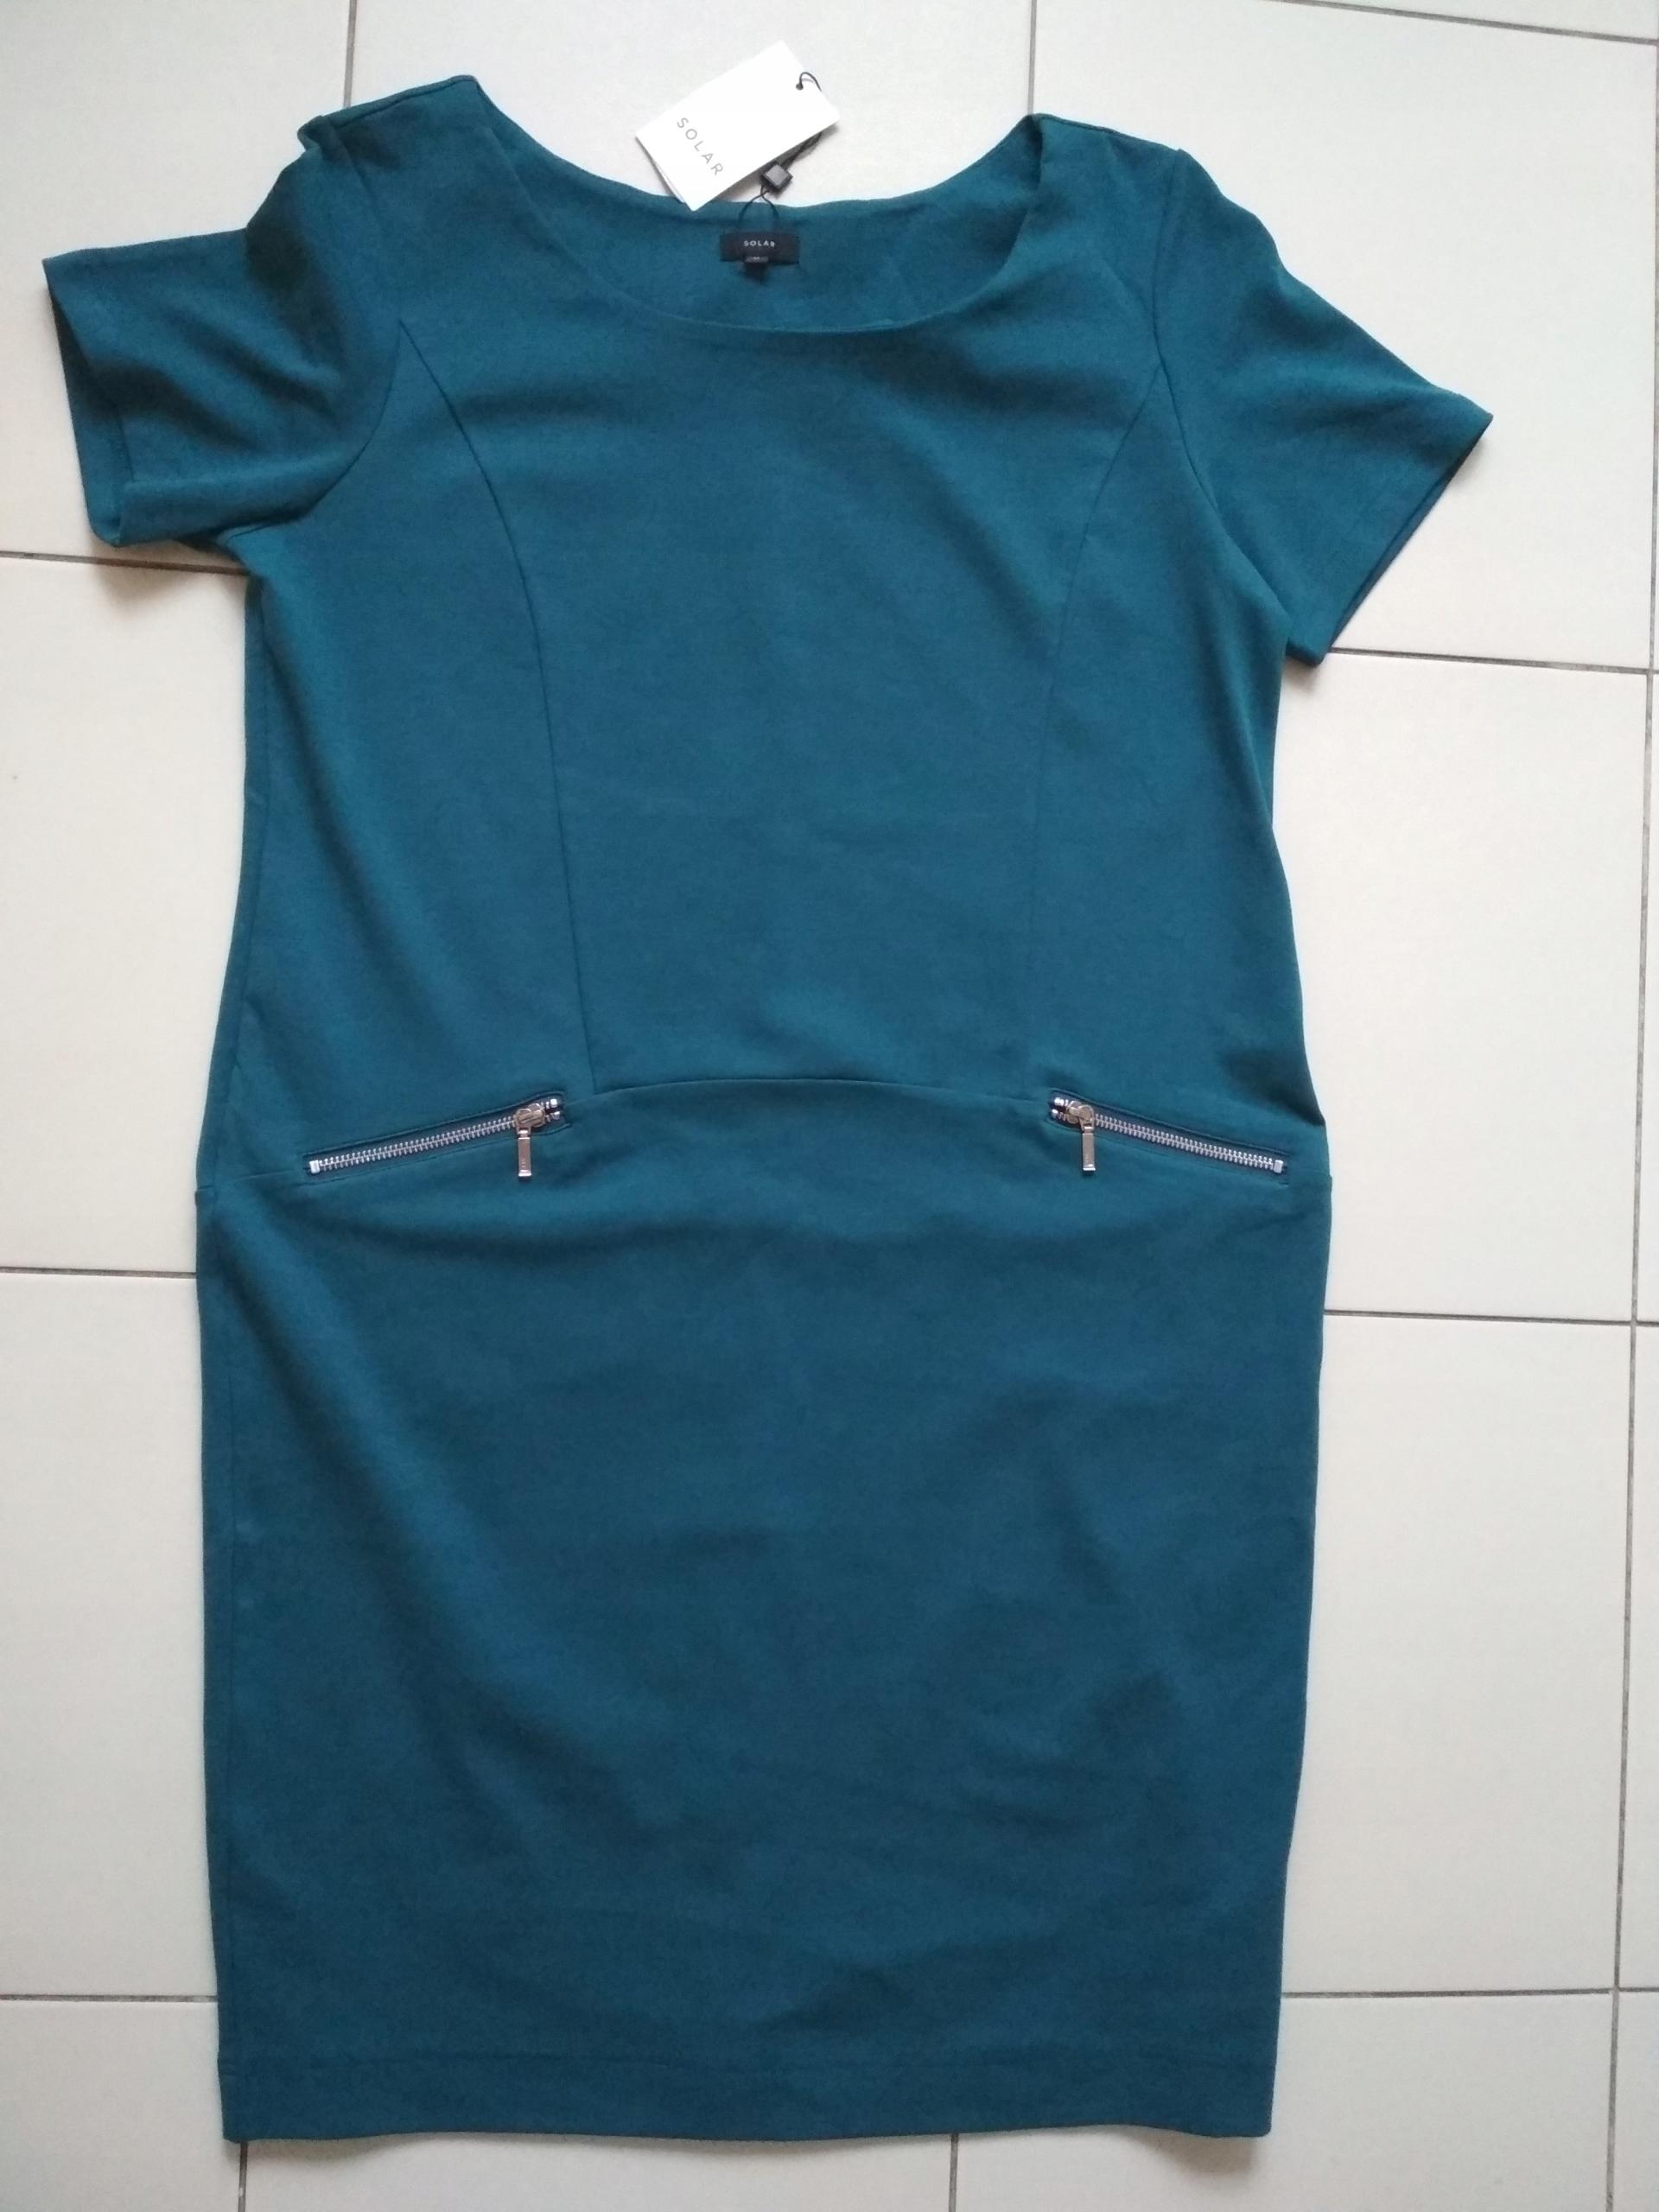 64e6a211df SOLAR sukienka turkusowa 42 - 7690324555 - oficjalne archiwum allegro